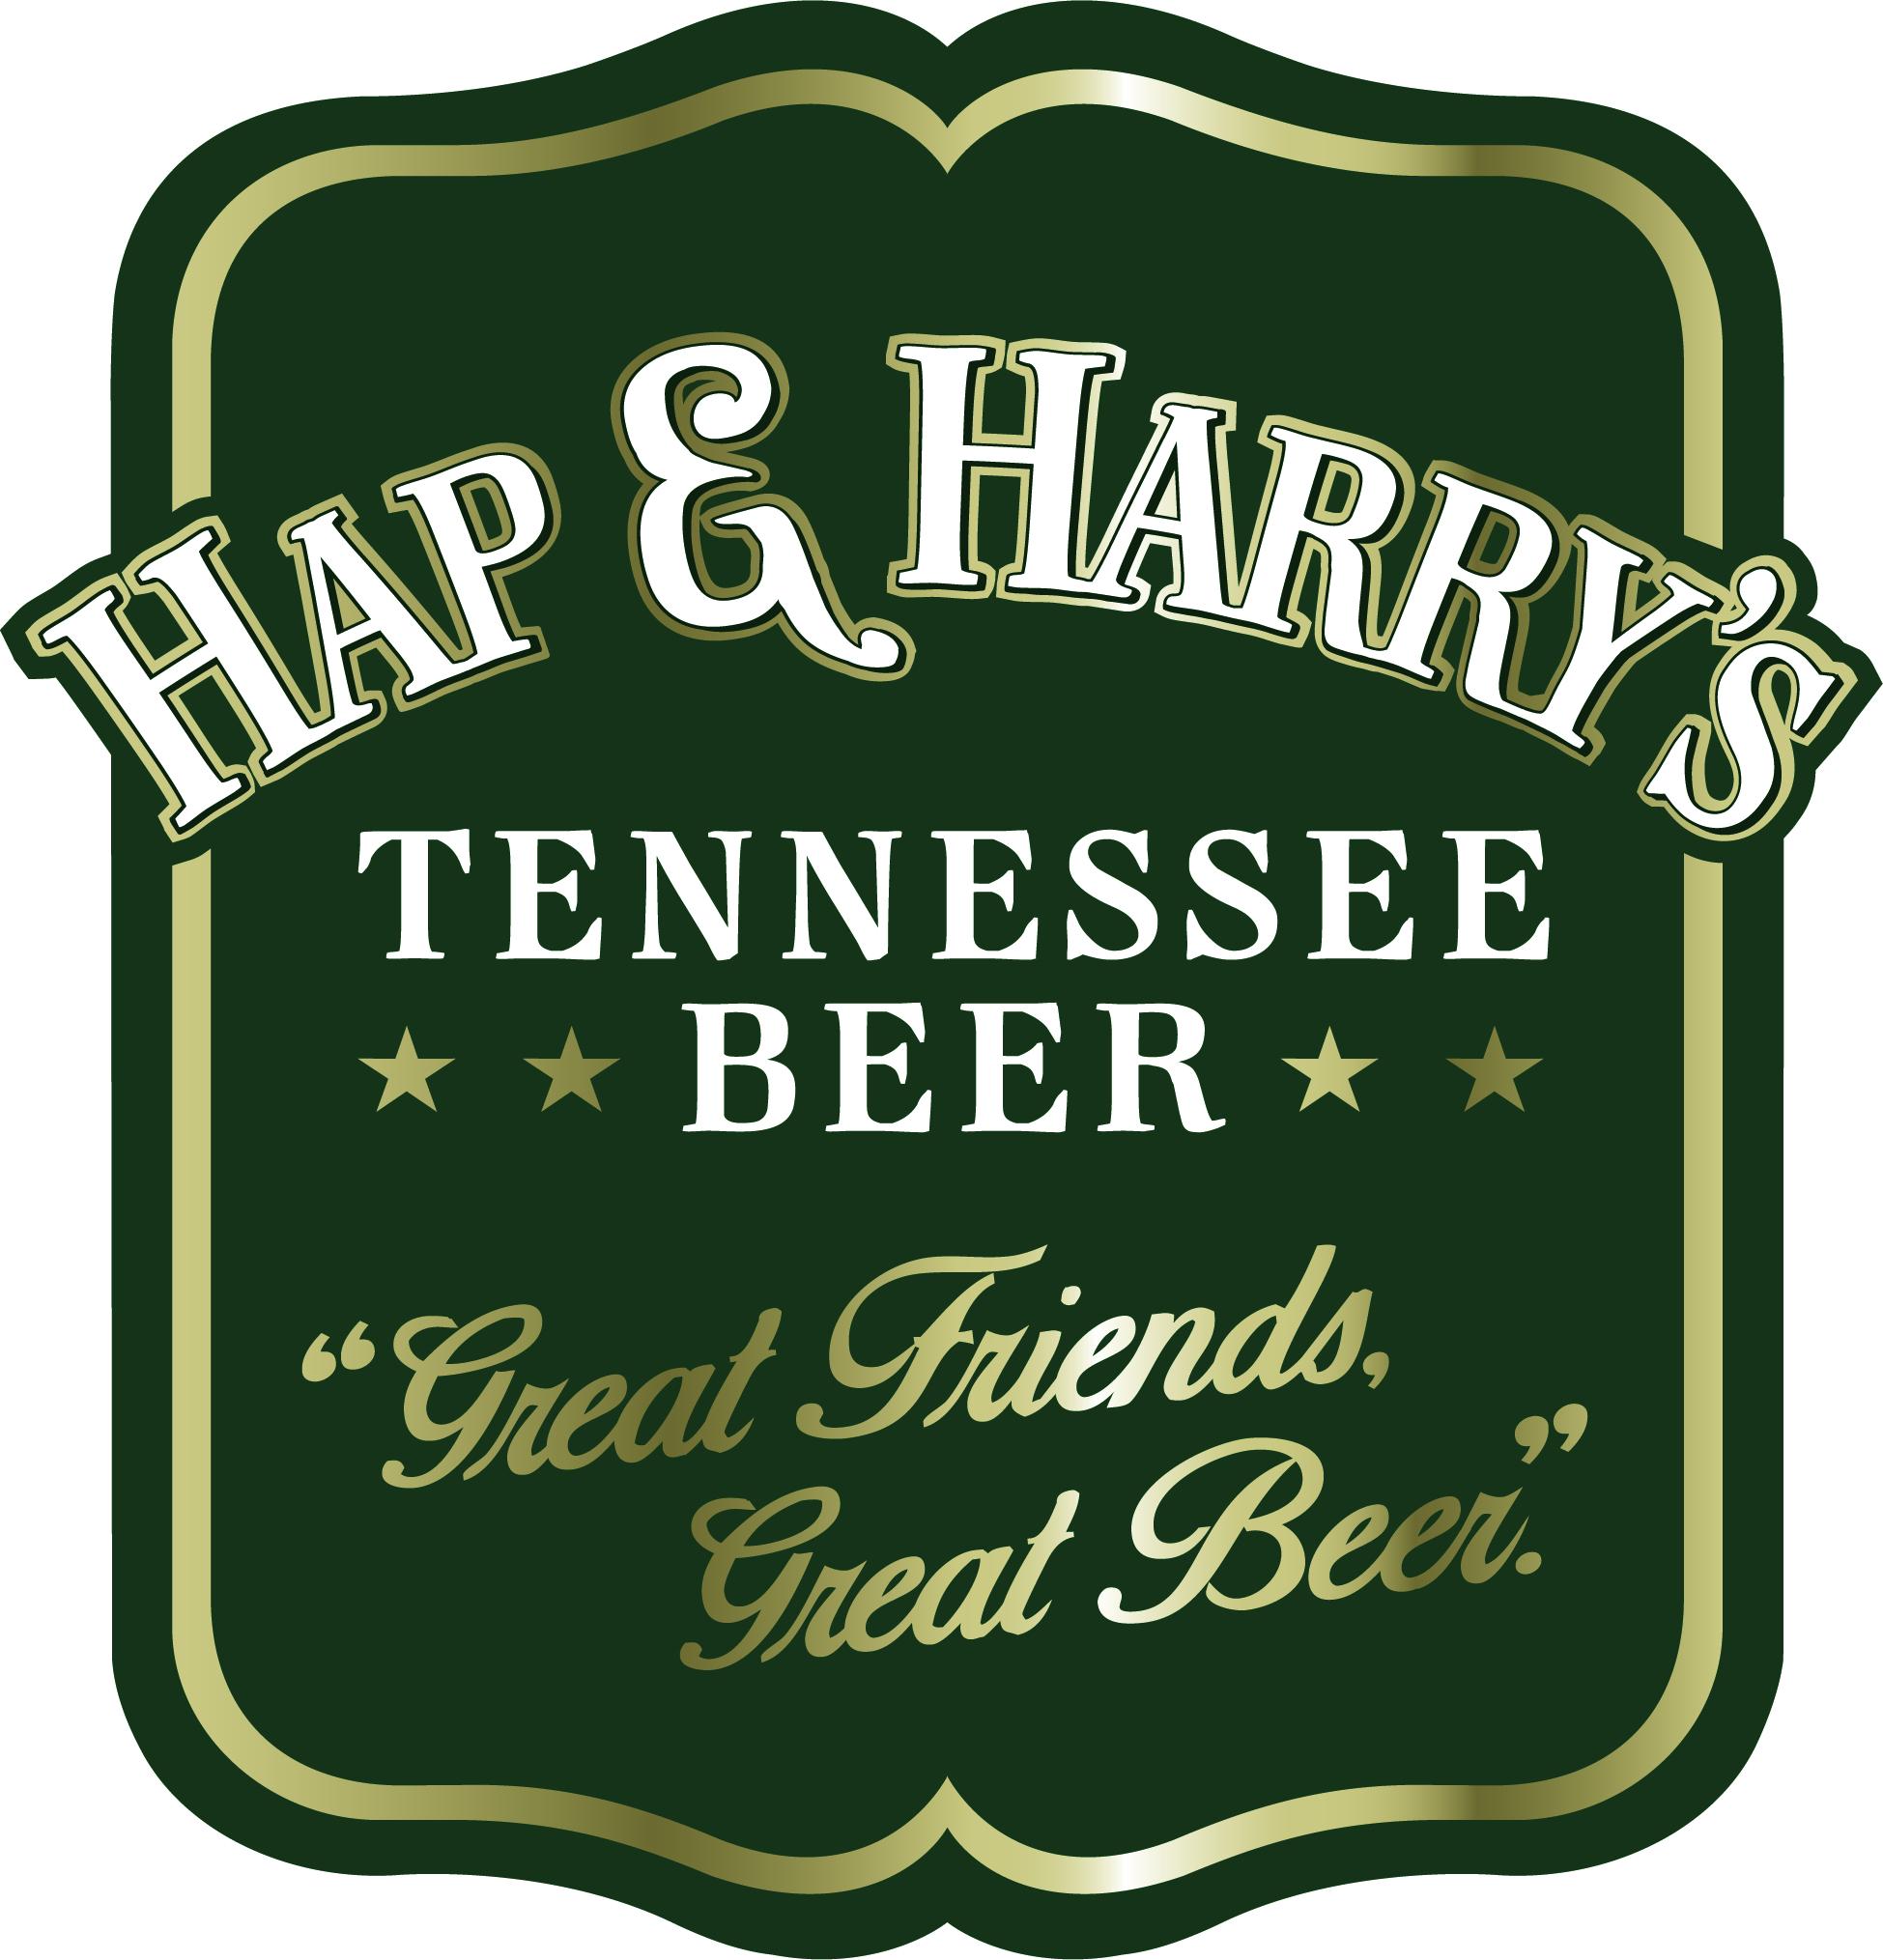 Hap-and-Harrys_NEW.jpg